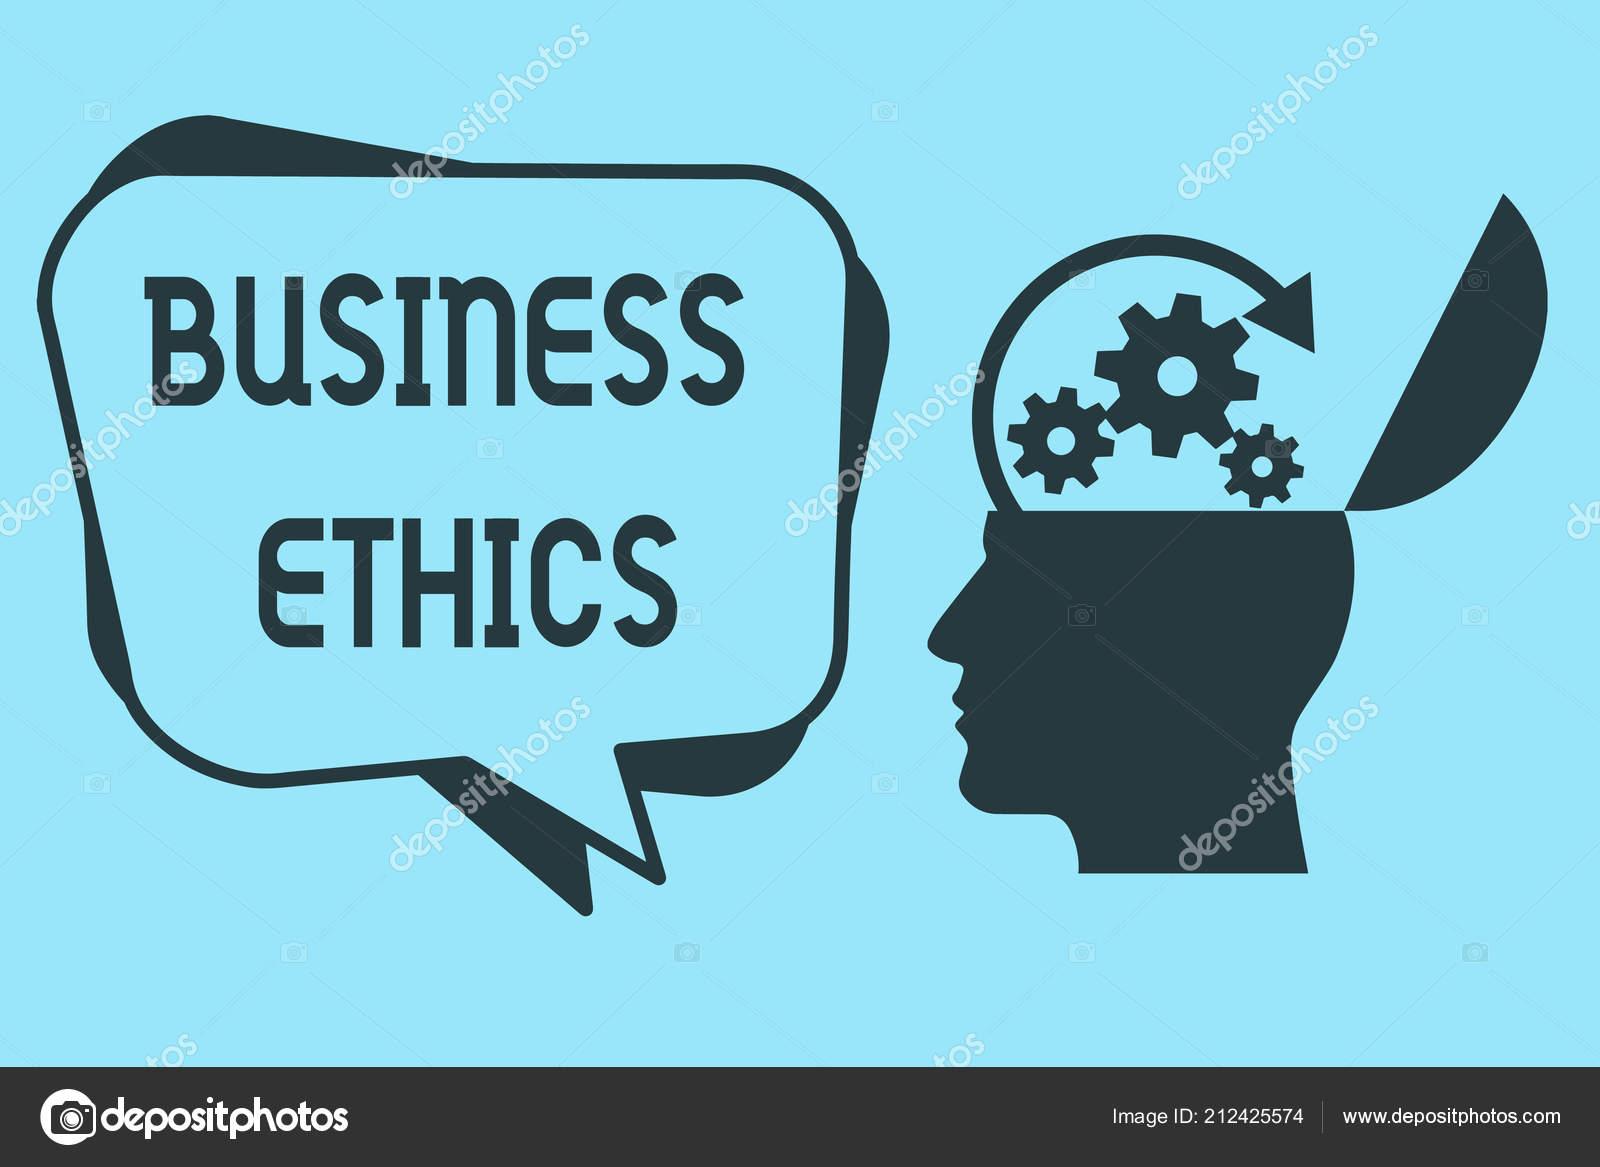 imclone business ethics Transcript business ethics business ethics a lacuna at some companies by a v raghu vamshi 08it-001 aseem sidhu 08it-009 g lakshmanan 08it-012 praveen sebastian 08it-021 puneet.